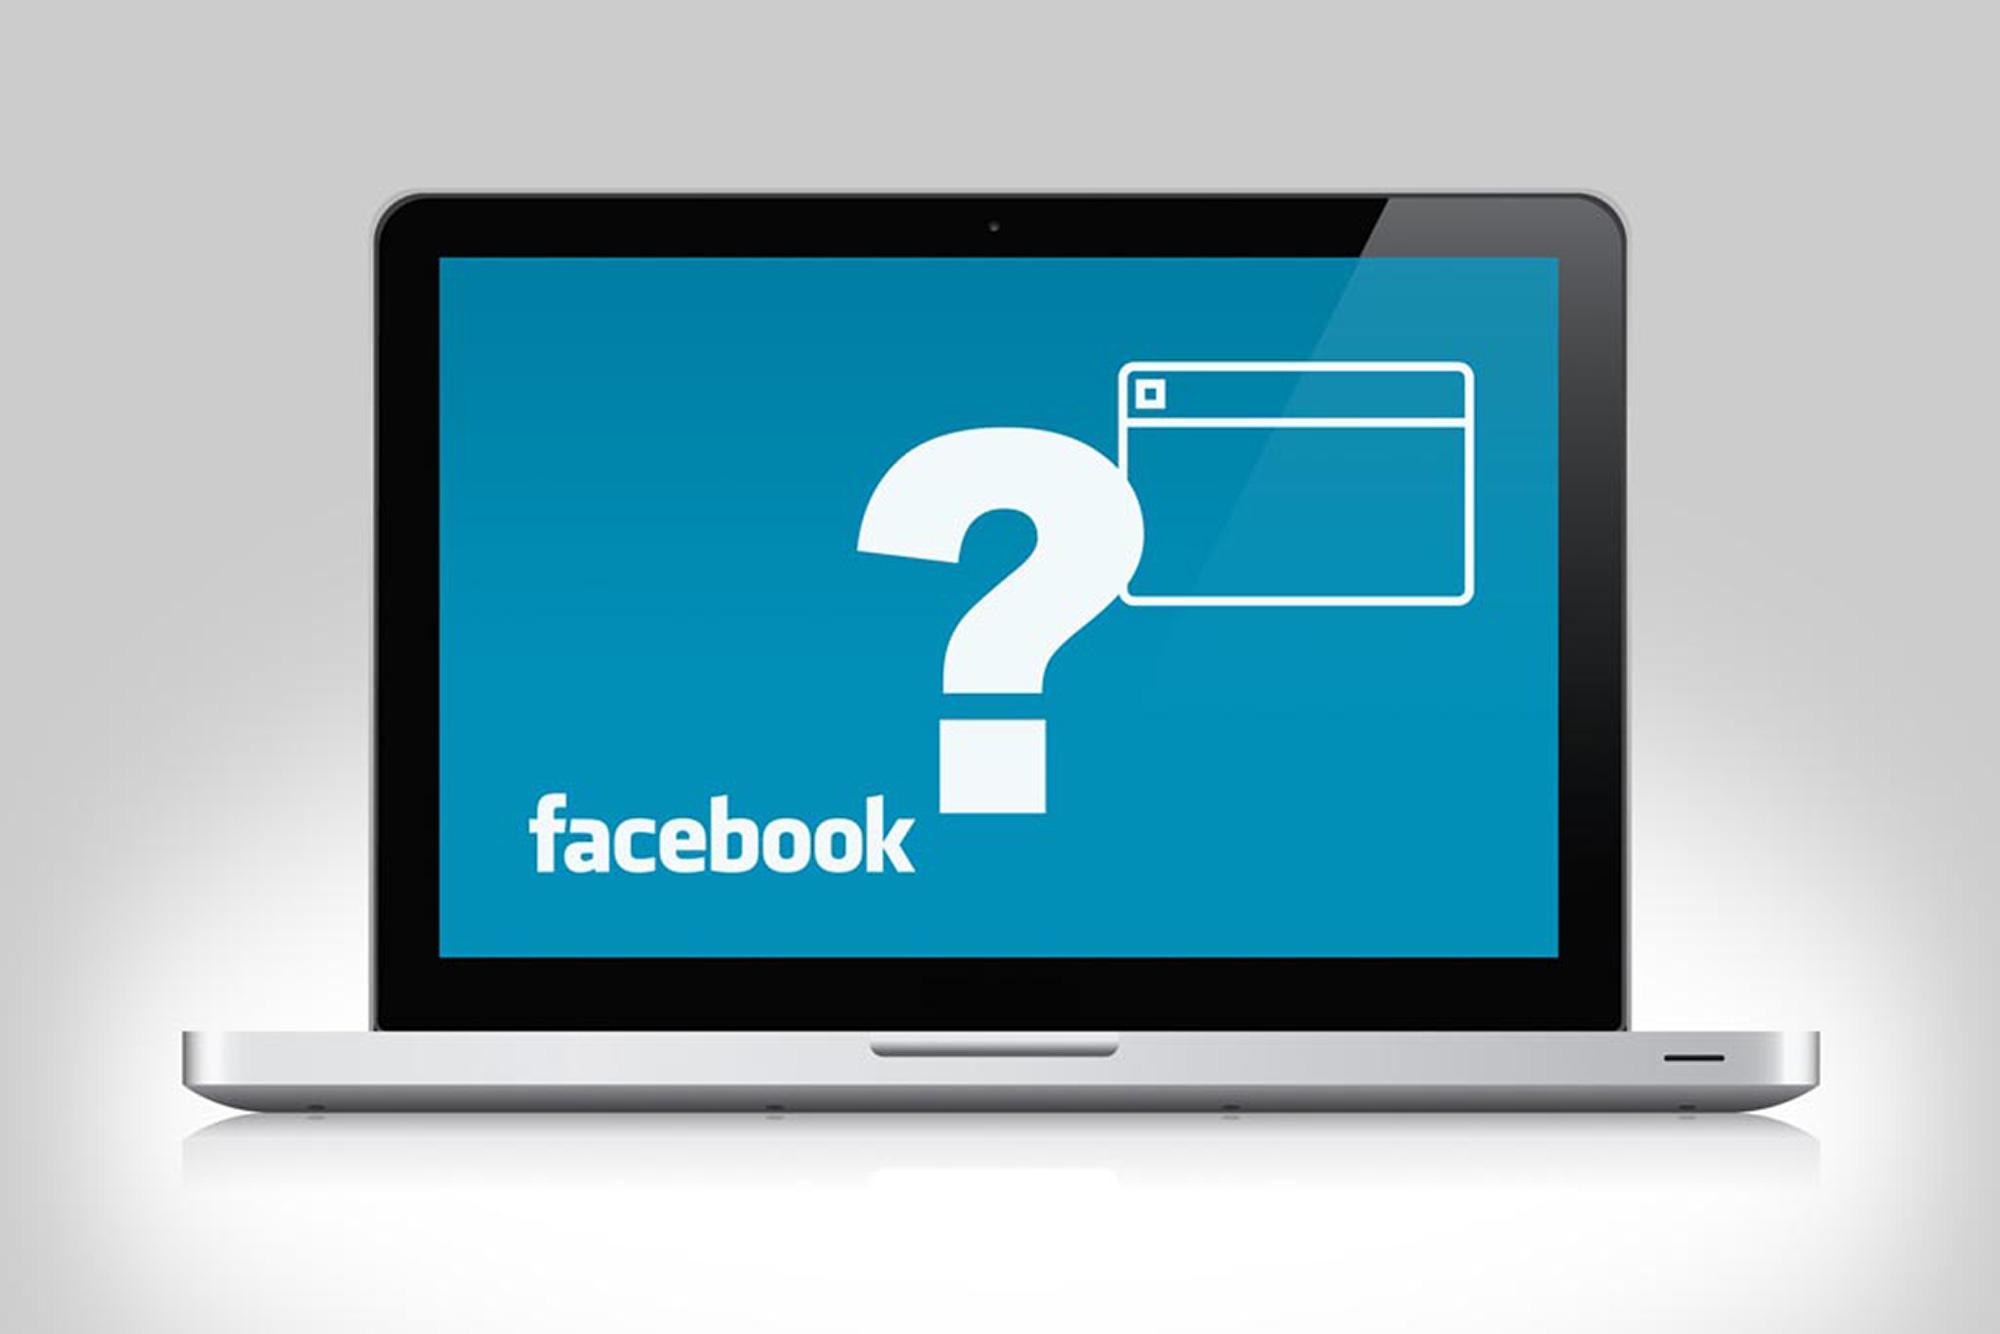 網頁設計公司,品牌顧問,推薦,Facebook,臉書,screen_share_site